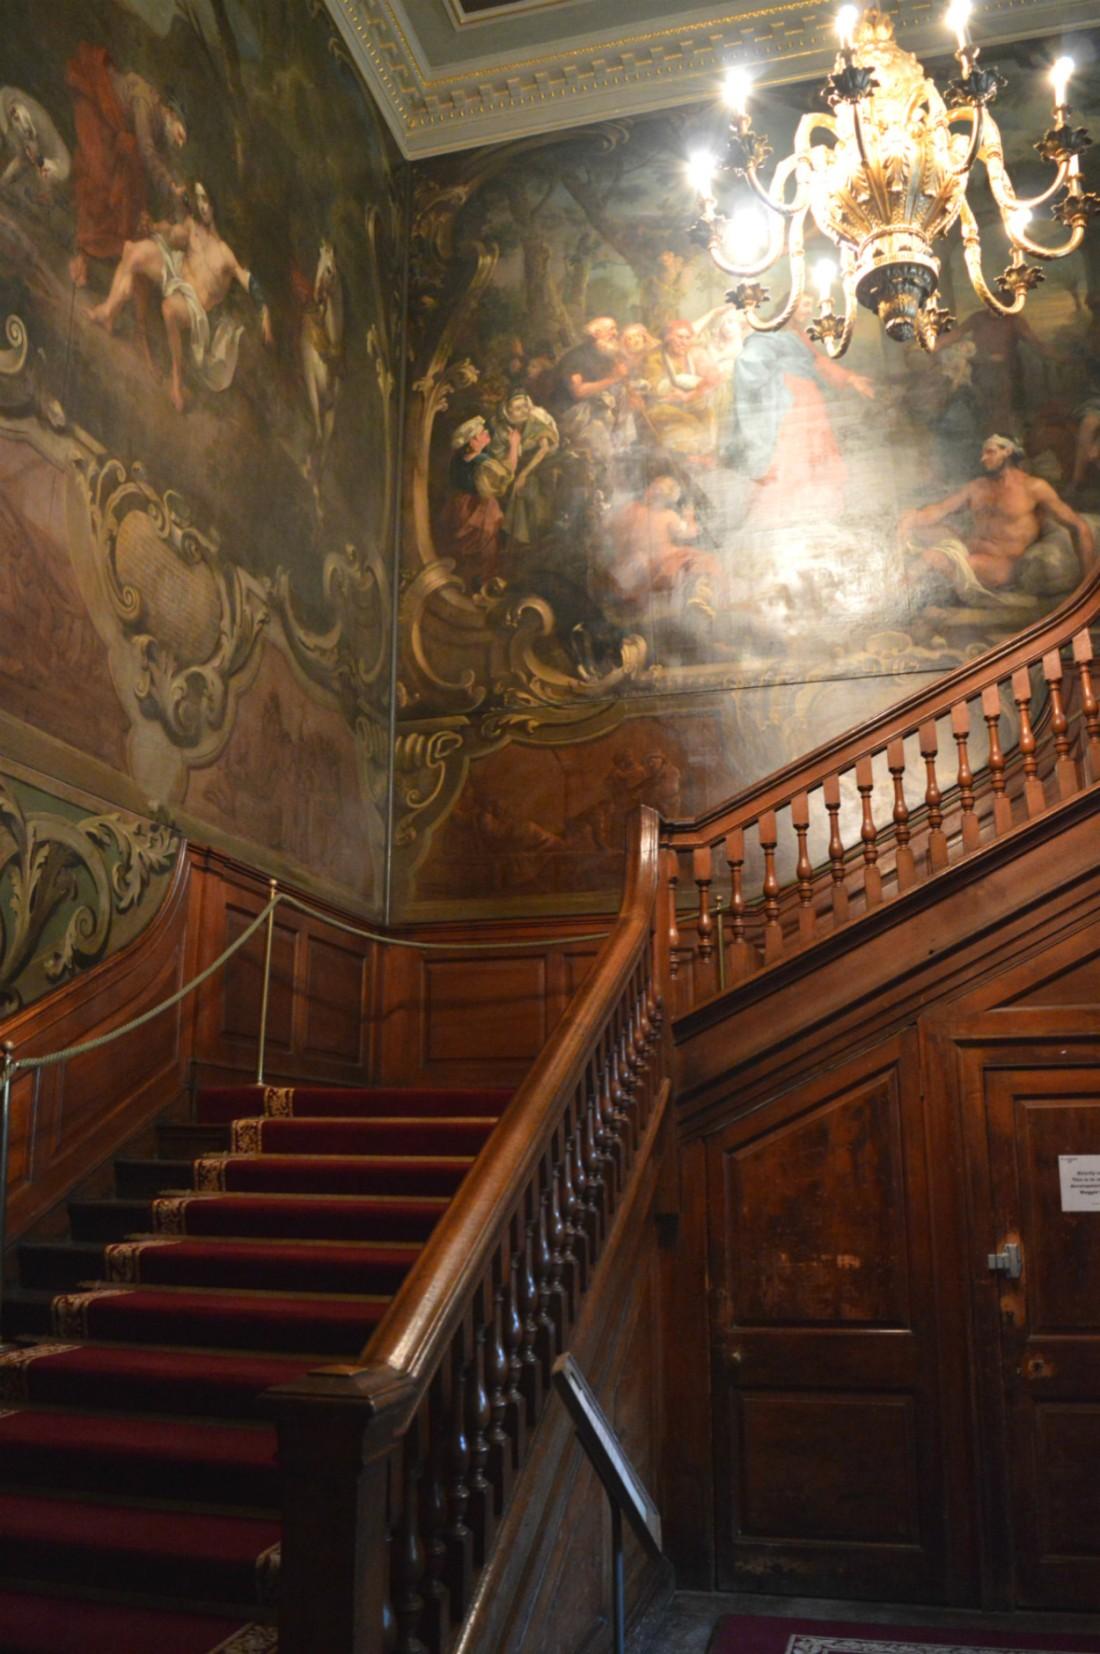 hogarth staircase, st bartholomew hospital museum, london